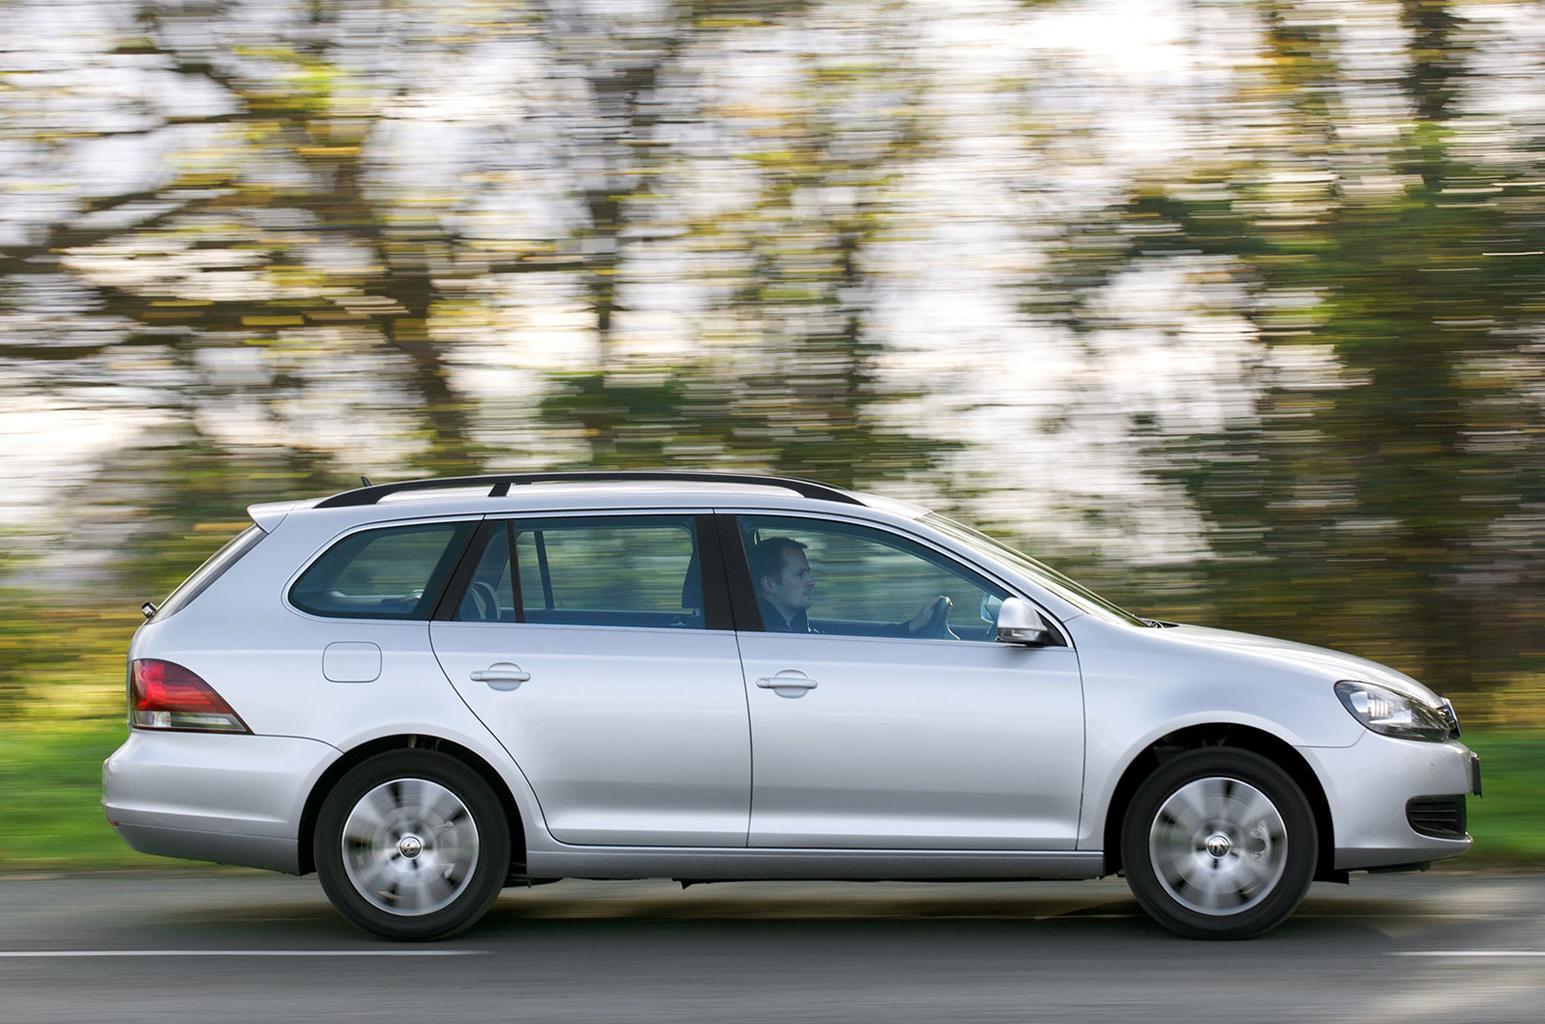 Company car tax or cash alternative?